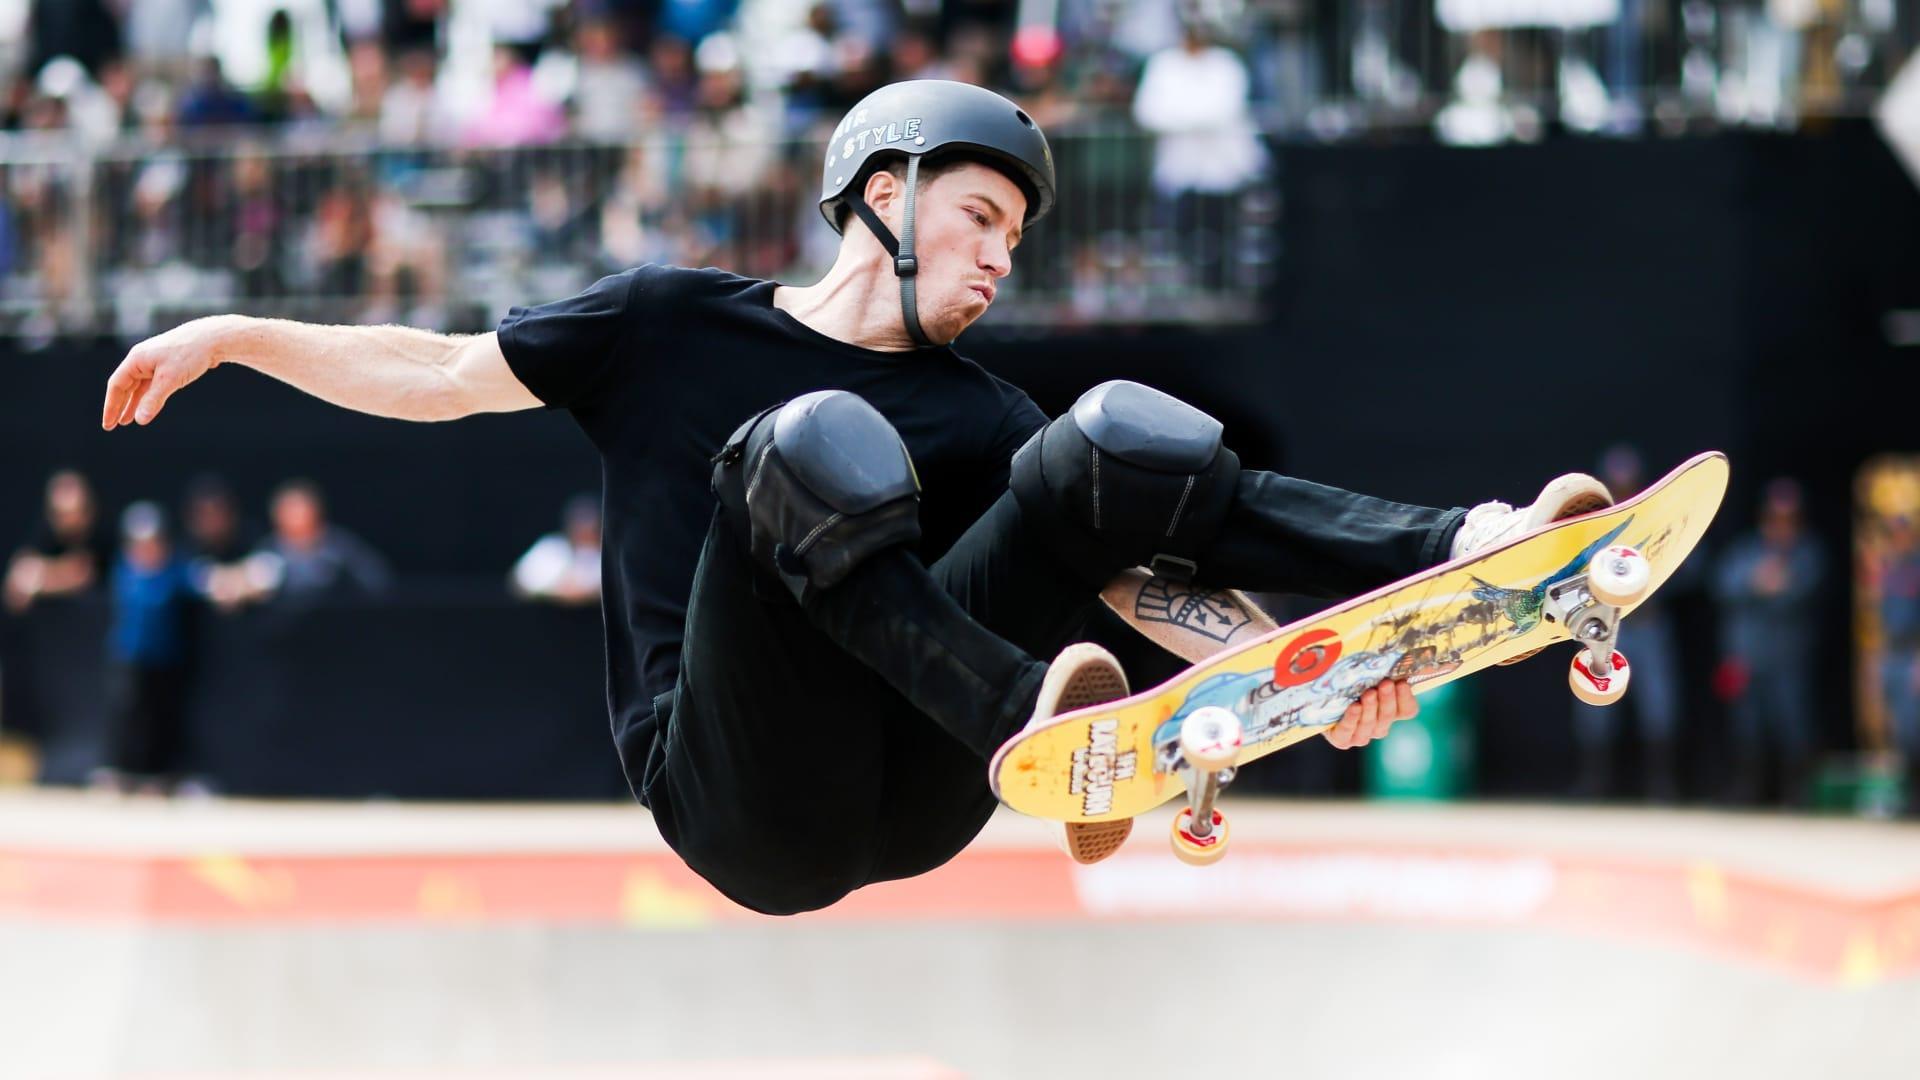 Shaun White: Snowboarder ends skateboard Olympic hopes